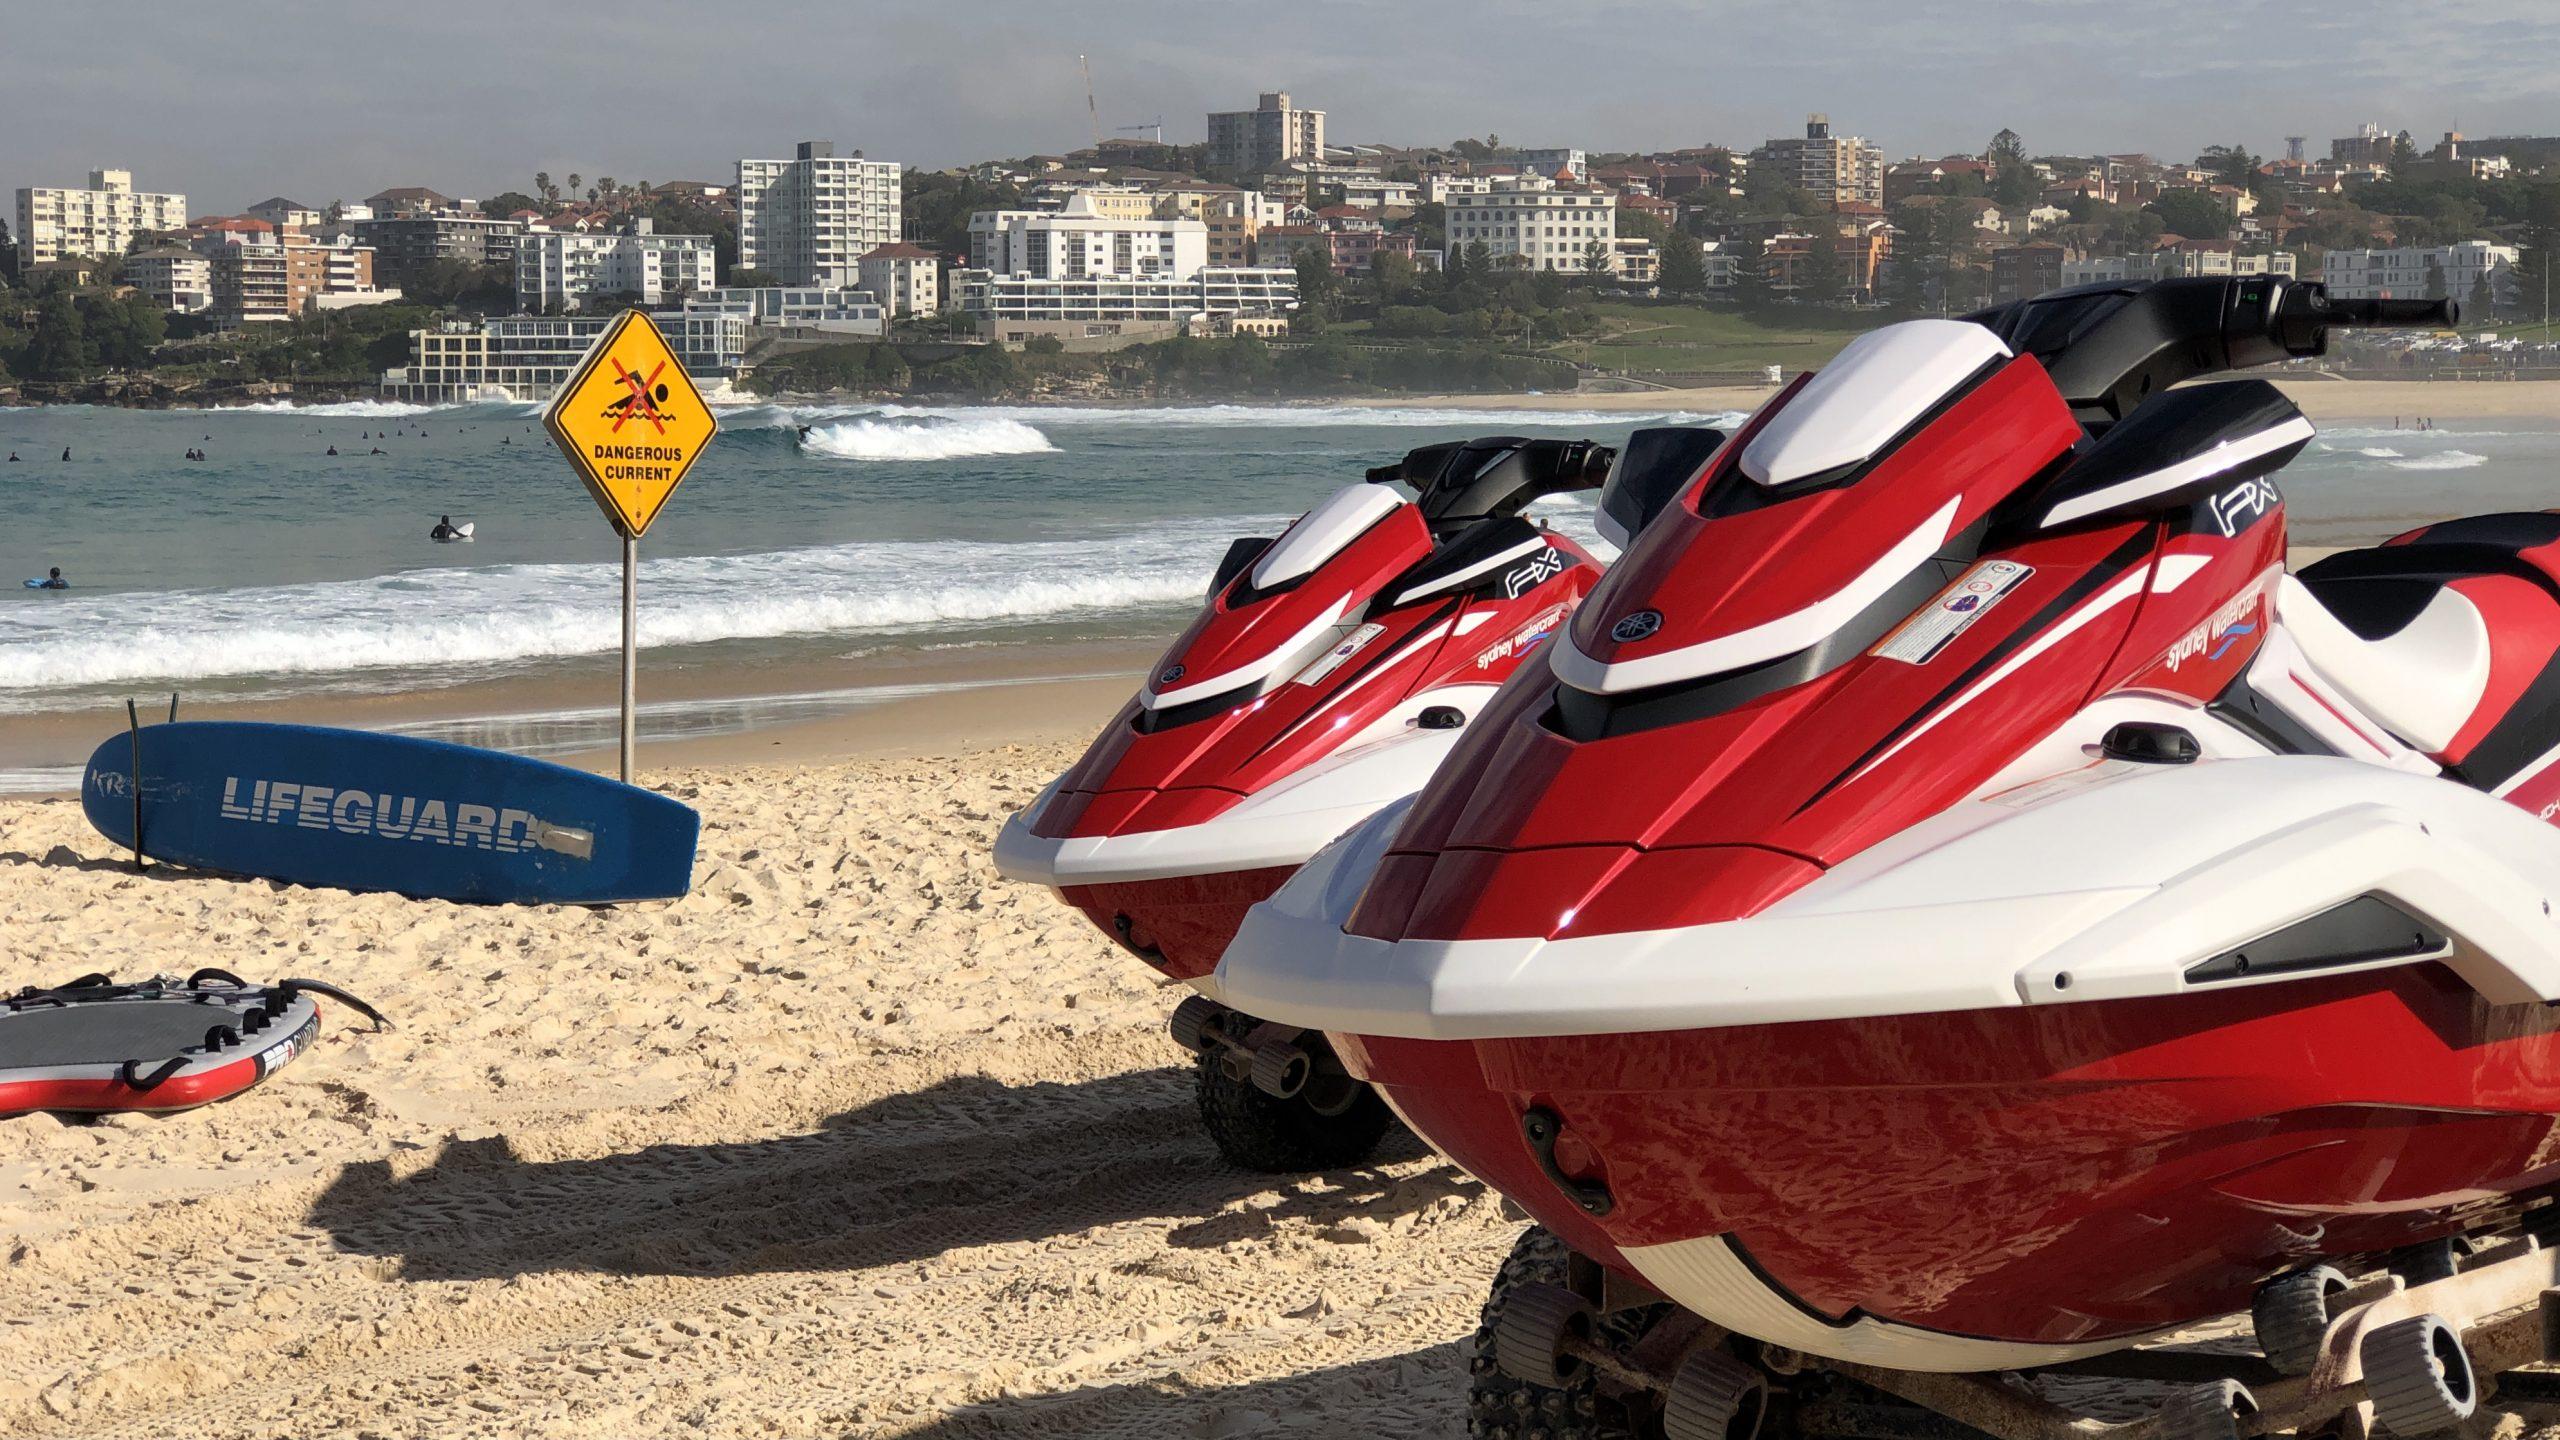 Bondi Rescue lifeguards take delivery of 2021 Yamaha FX HO WaveRunners